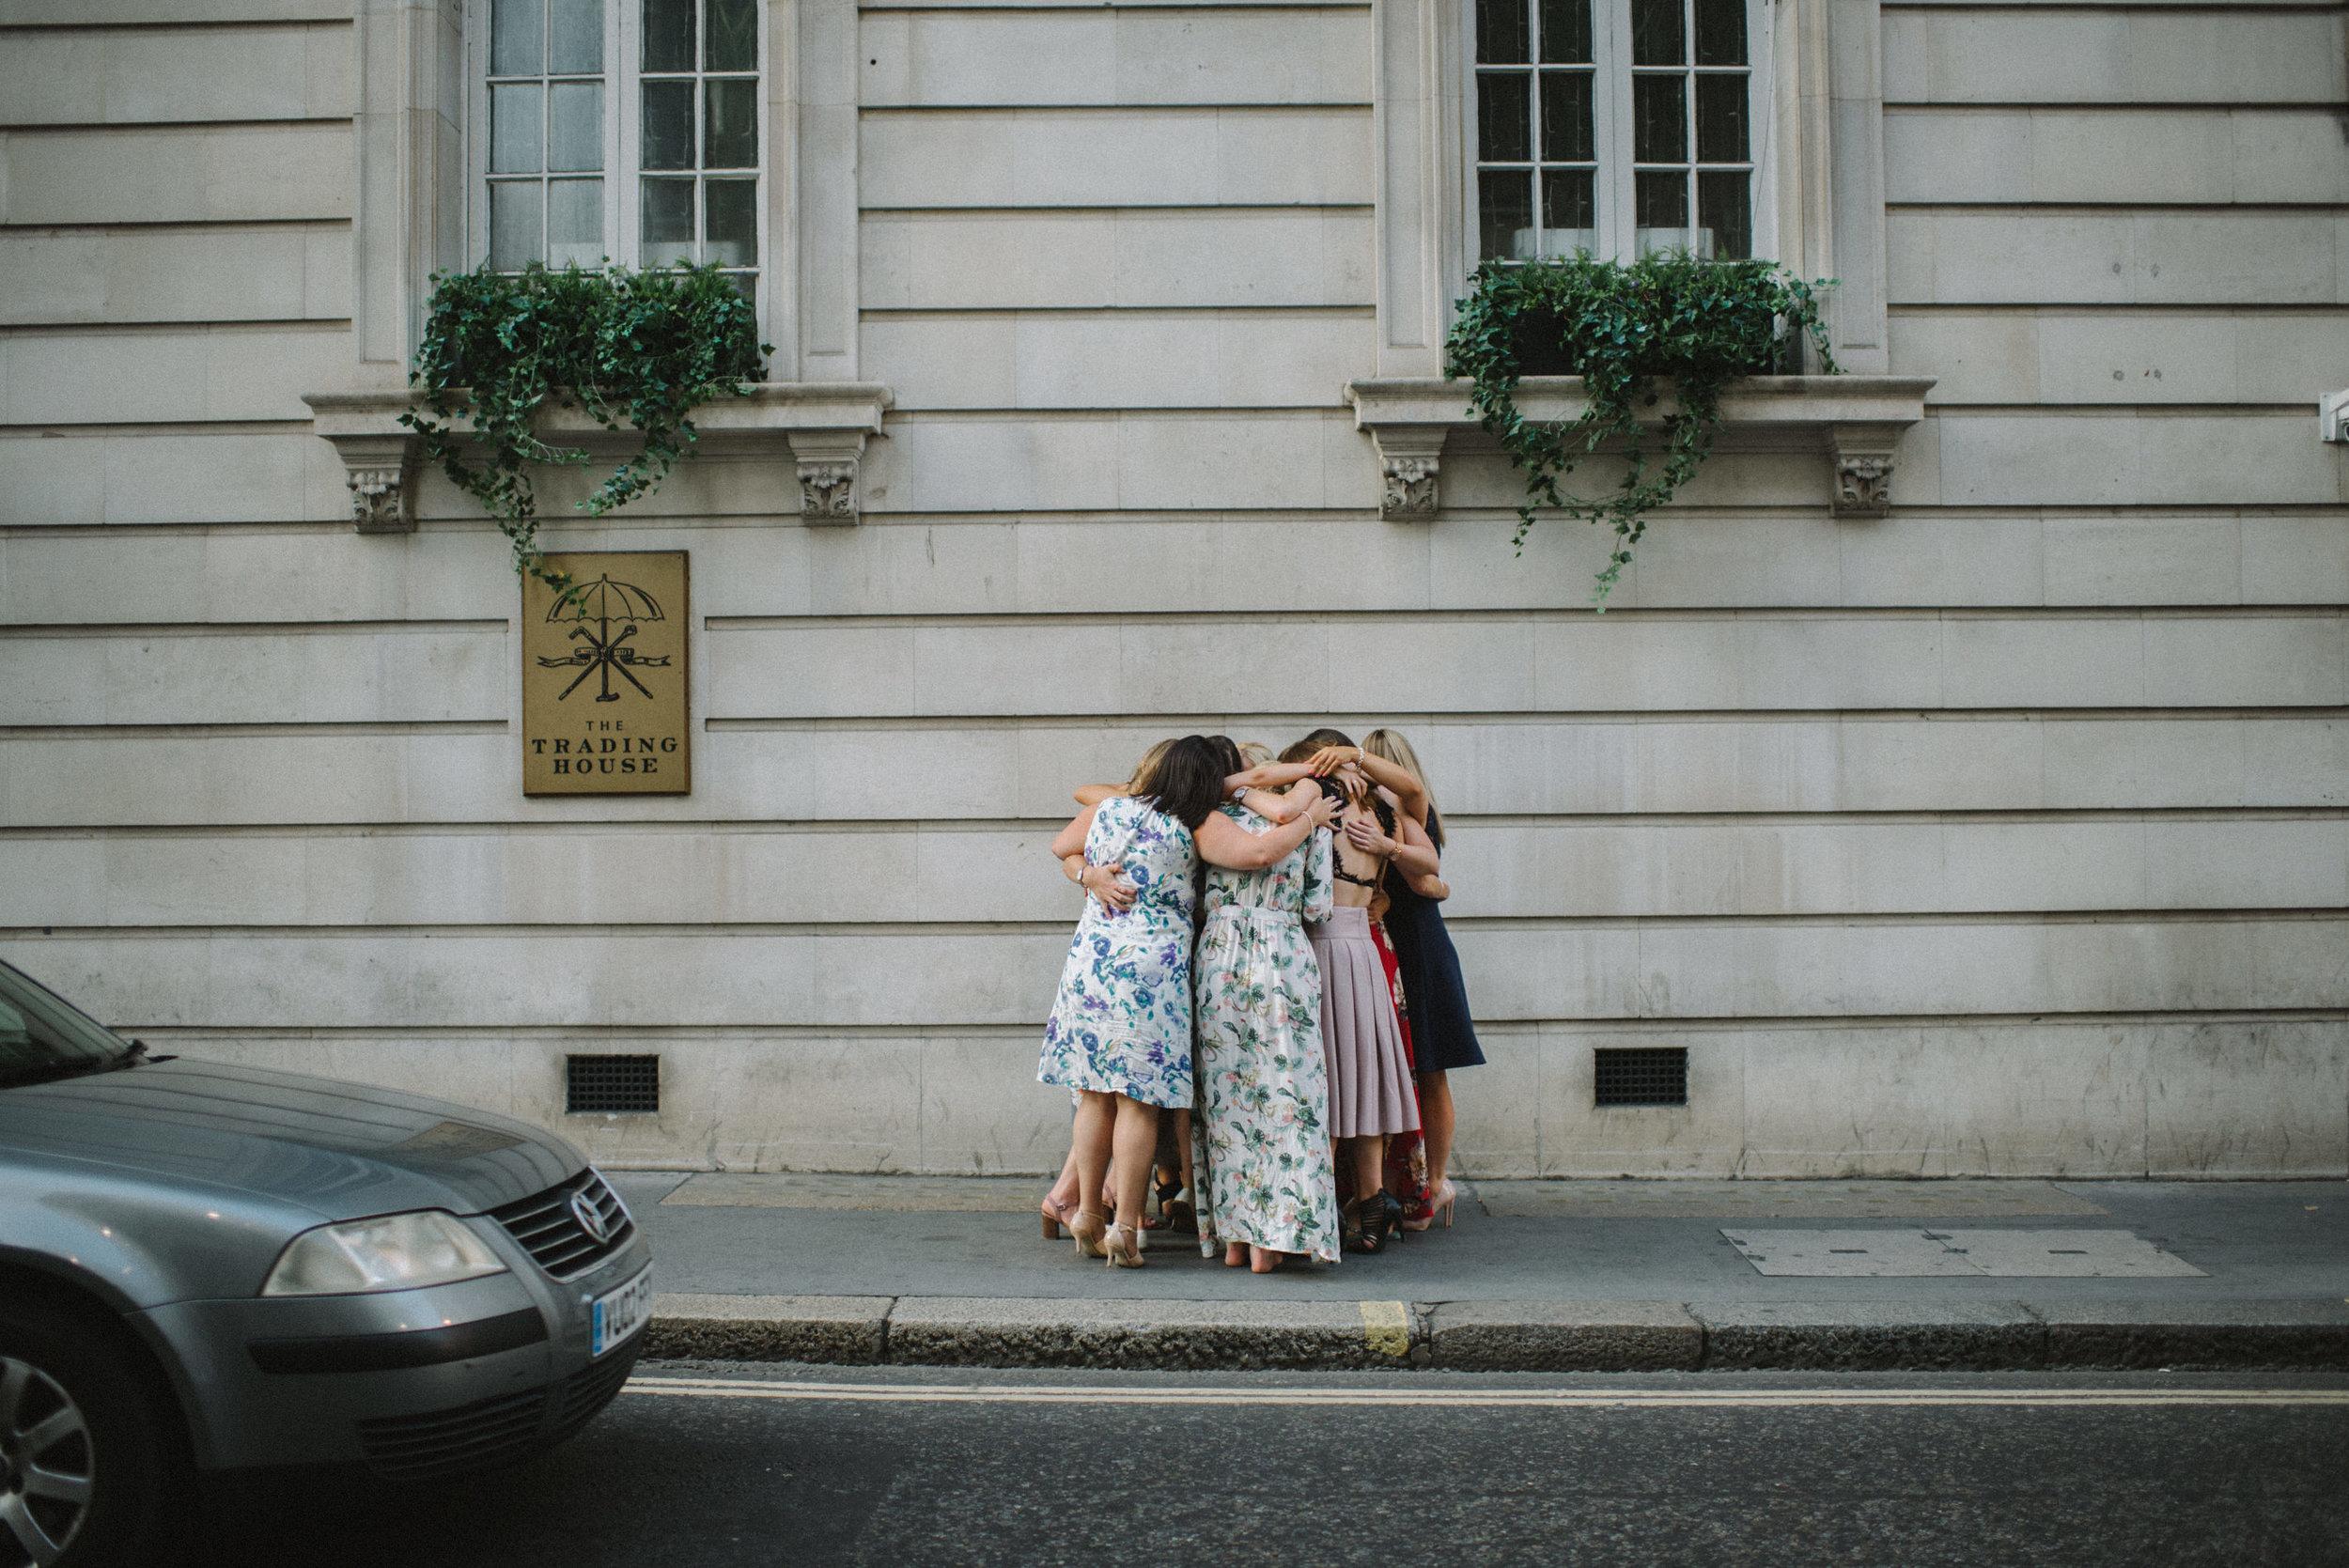 0131-LISA-DEVINE-PHOTOGRAPHY-ALTERNATIVE-WEDDING-PHOTOGRAPHY-SCOTLAND-DESTINATION-WEDDINGS-GLASGOW-WEDDINGS-COOL-WEDDINGS-STYLISH-WEDDINGS.JPG